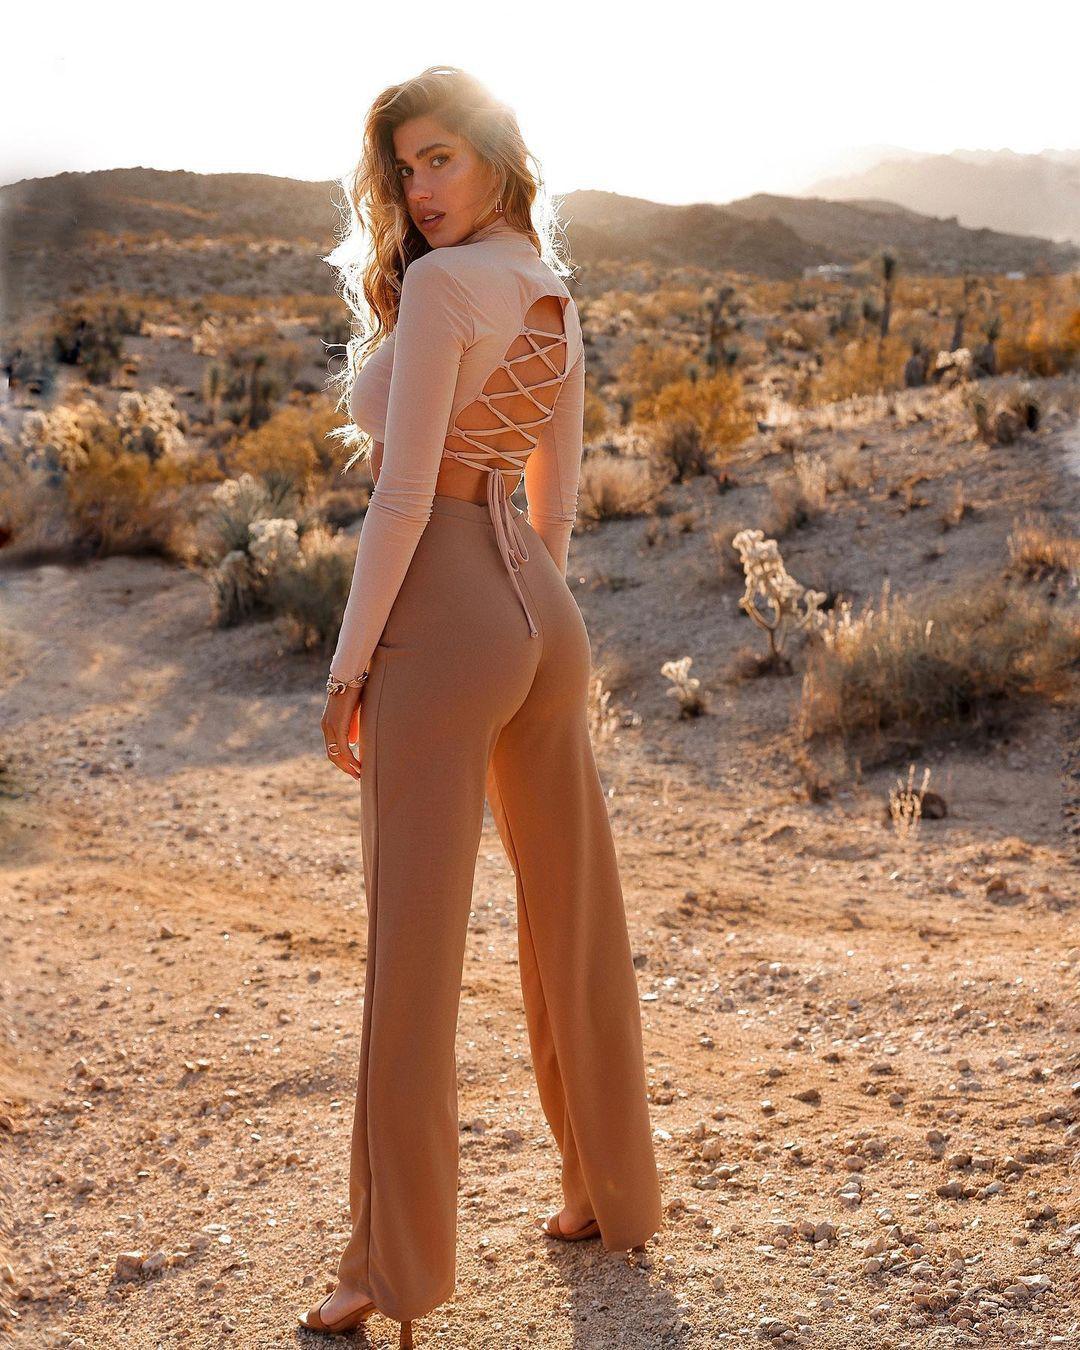 Kara Del Toro Sexy Ass